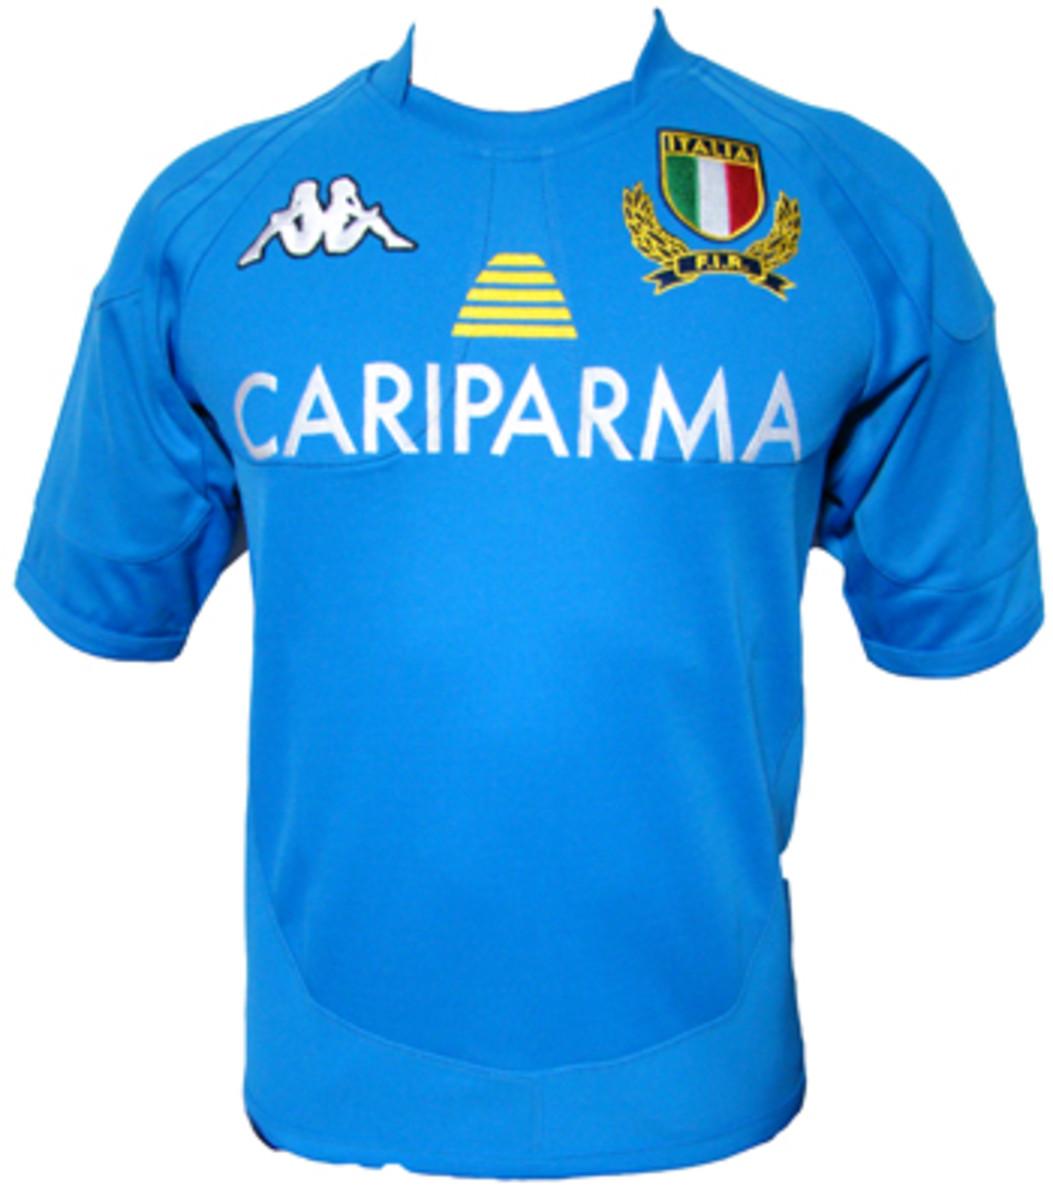 Italy's 2012 home kit